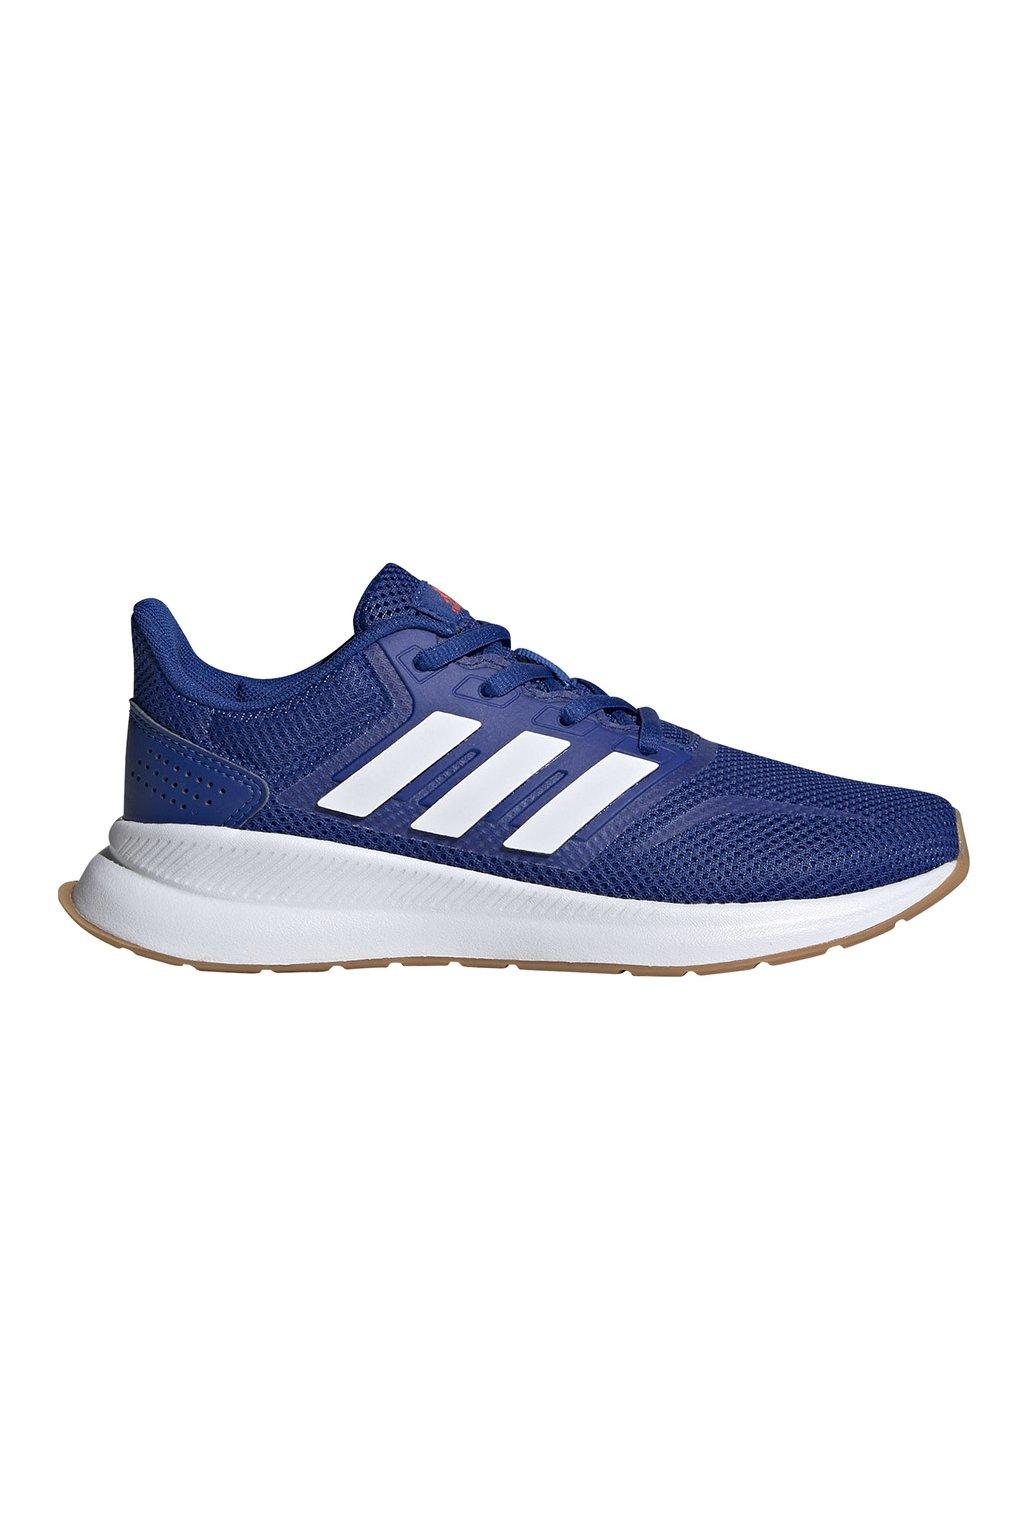 Detská obuv Adidas Runfalcon K modrá FV8838